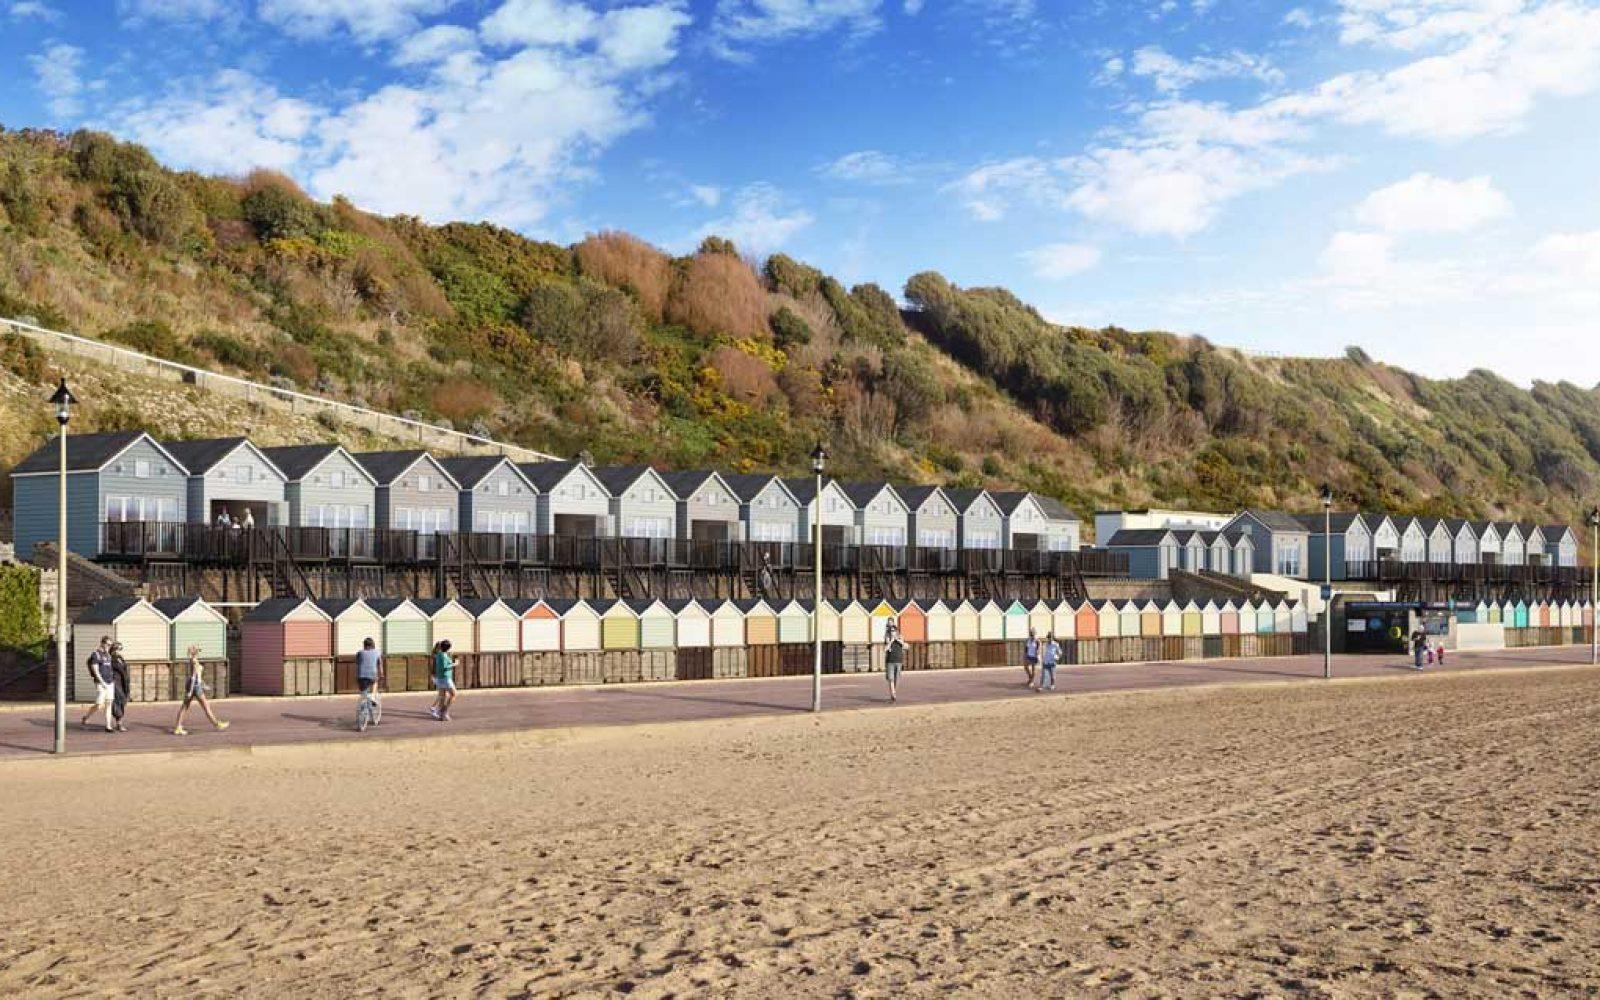 CGI impression of extra beach huts